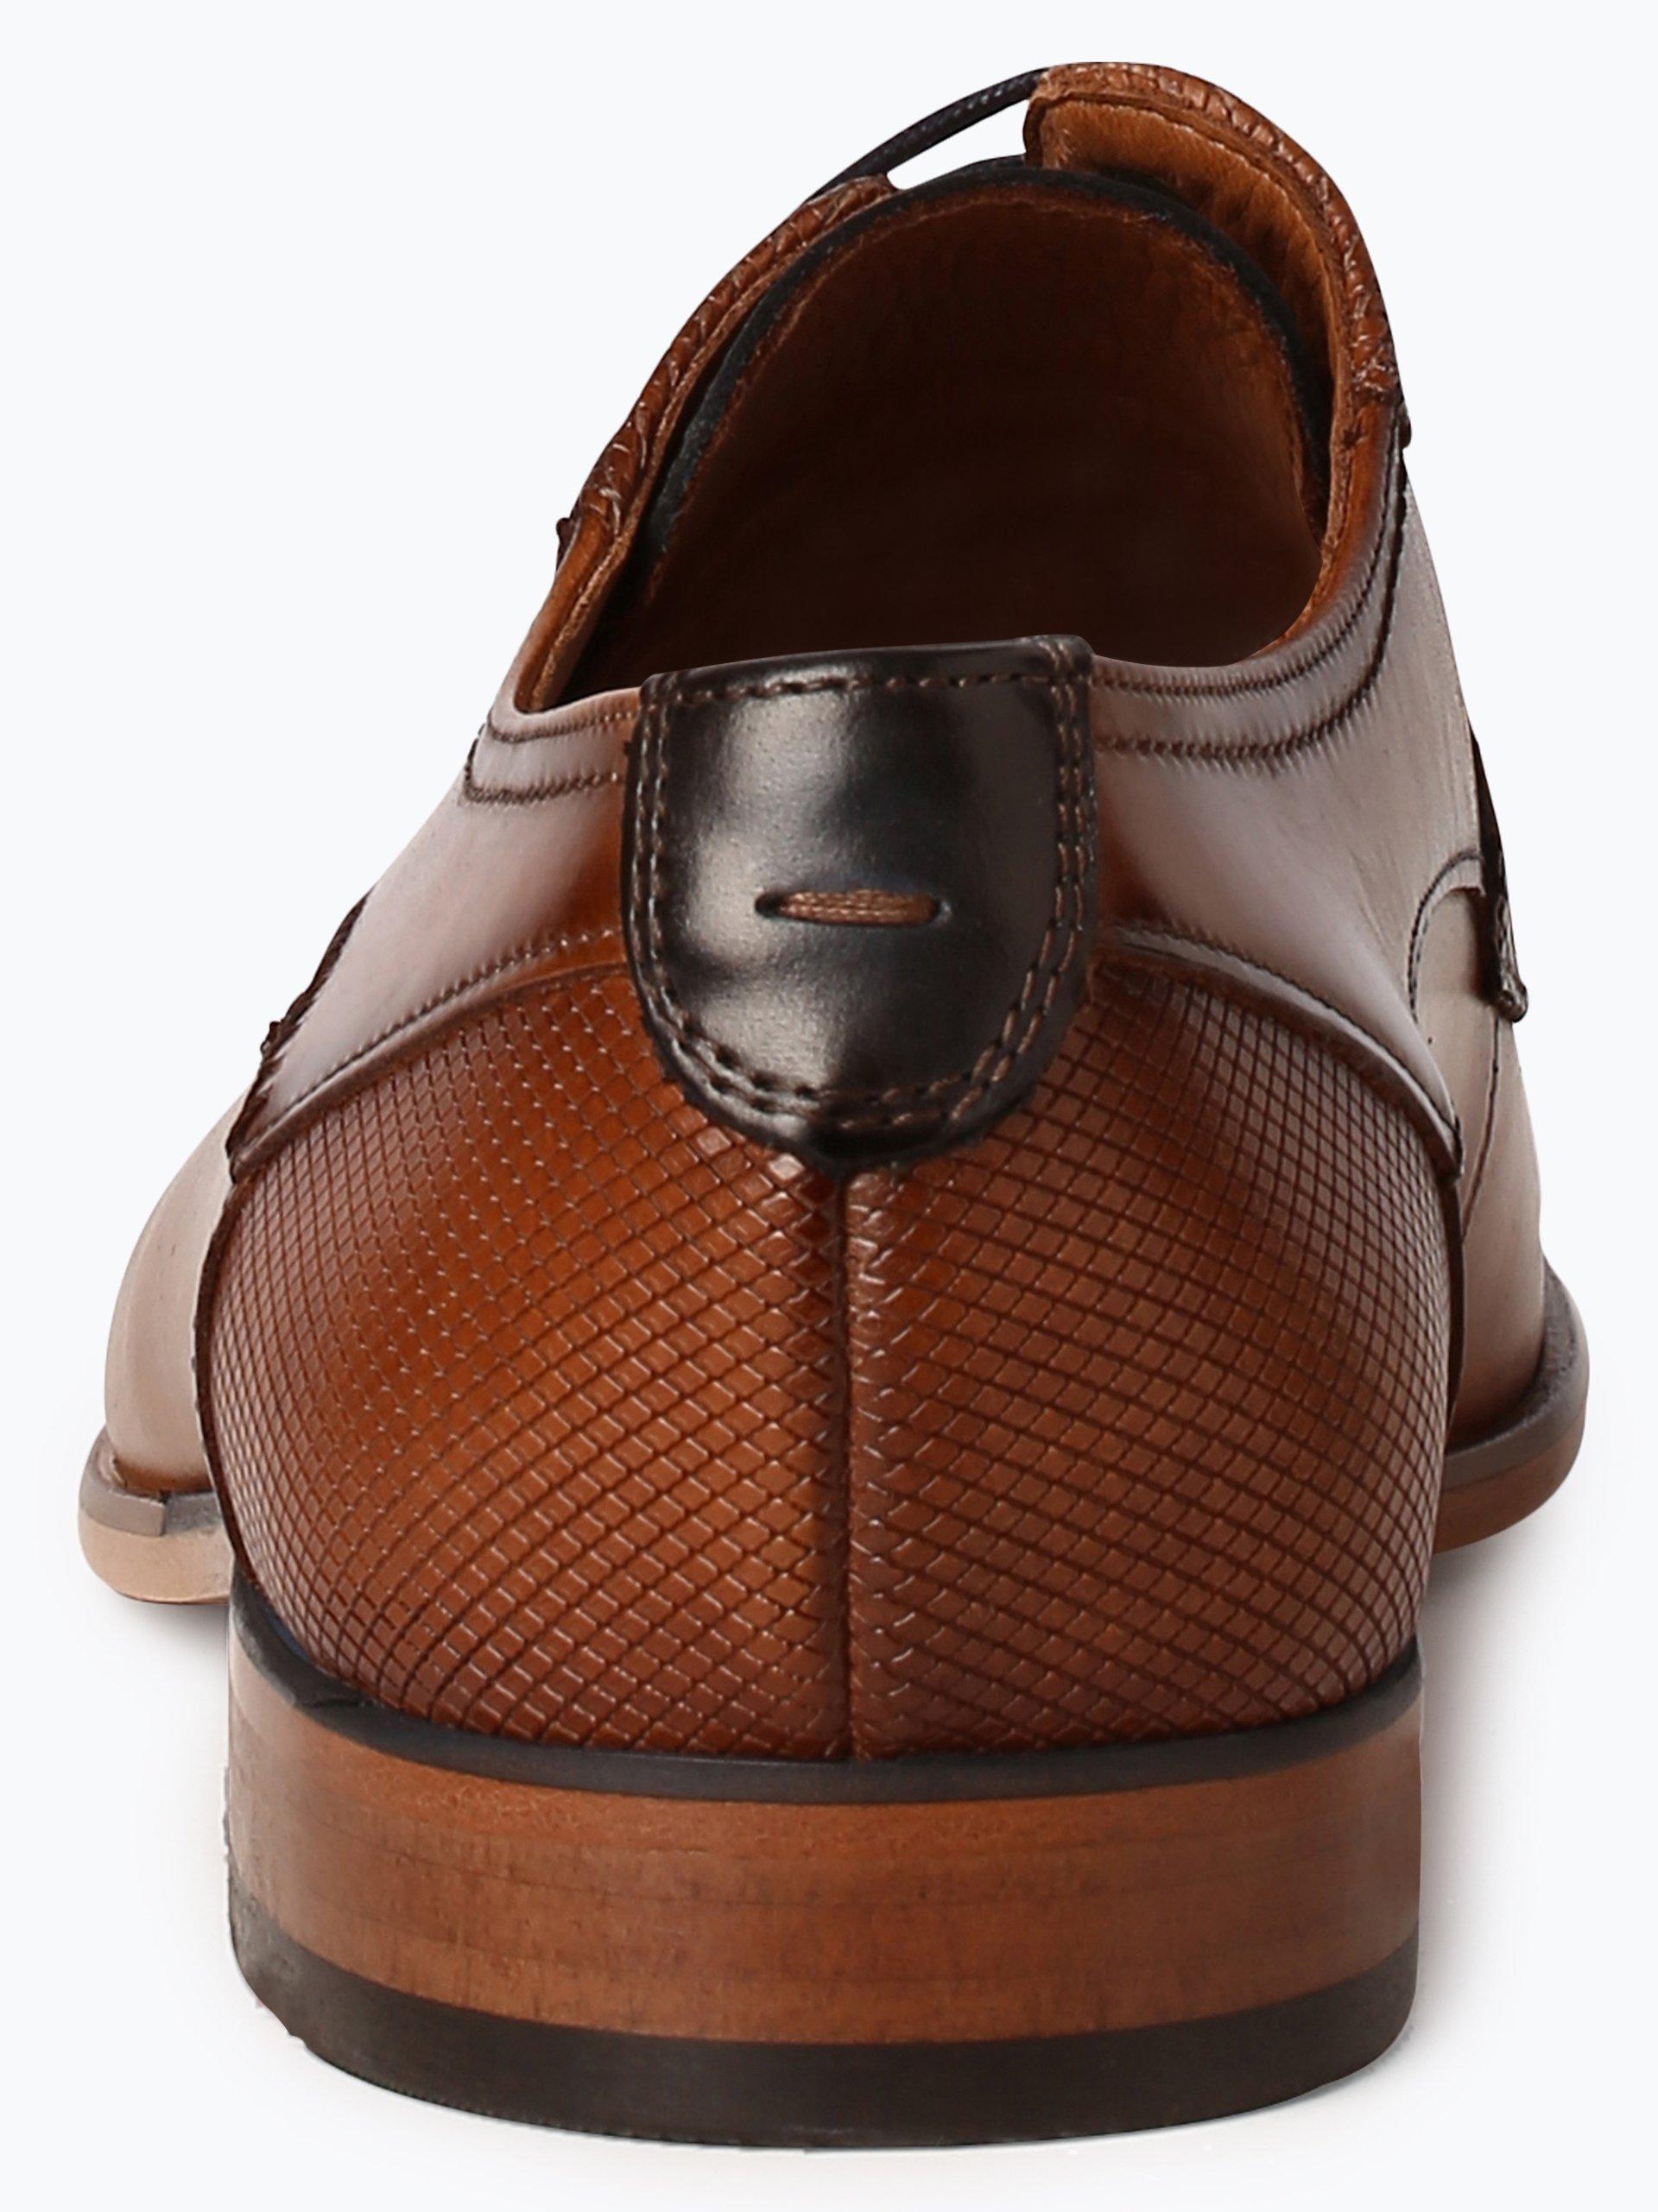 Lloyd Herren Schnürschuhe aus Leder - Perseo